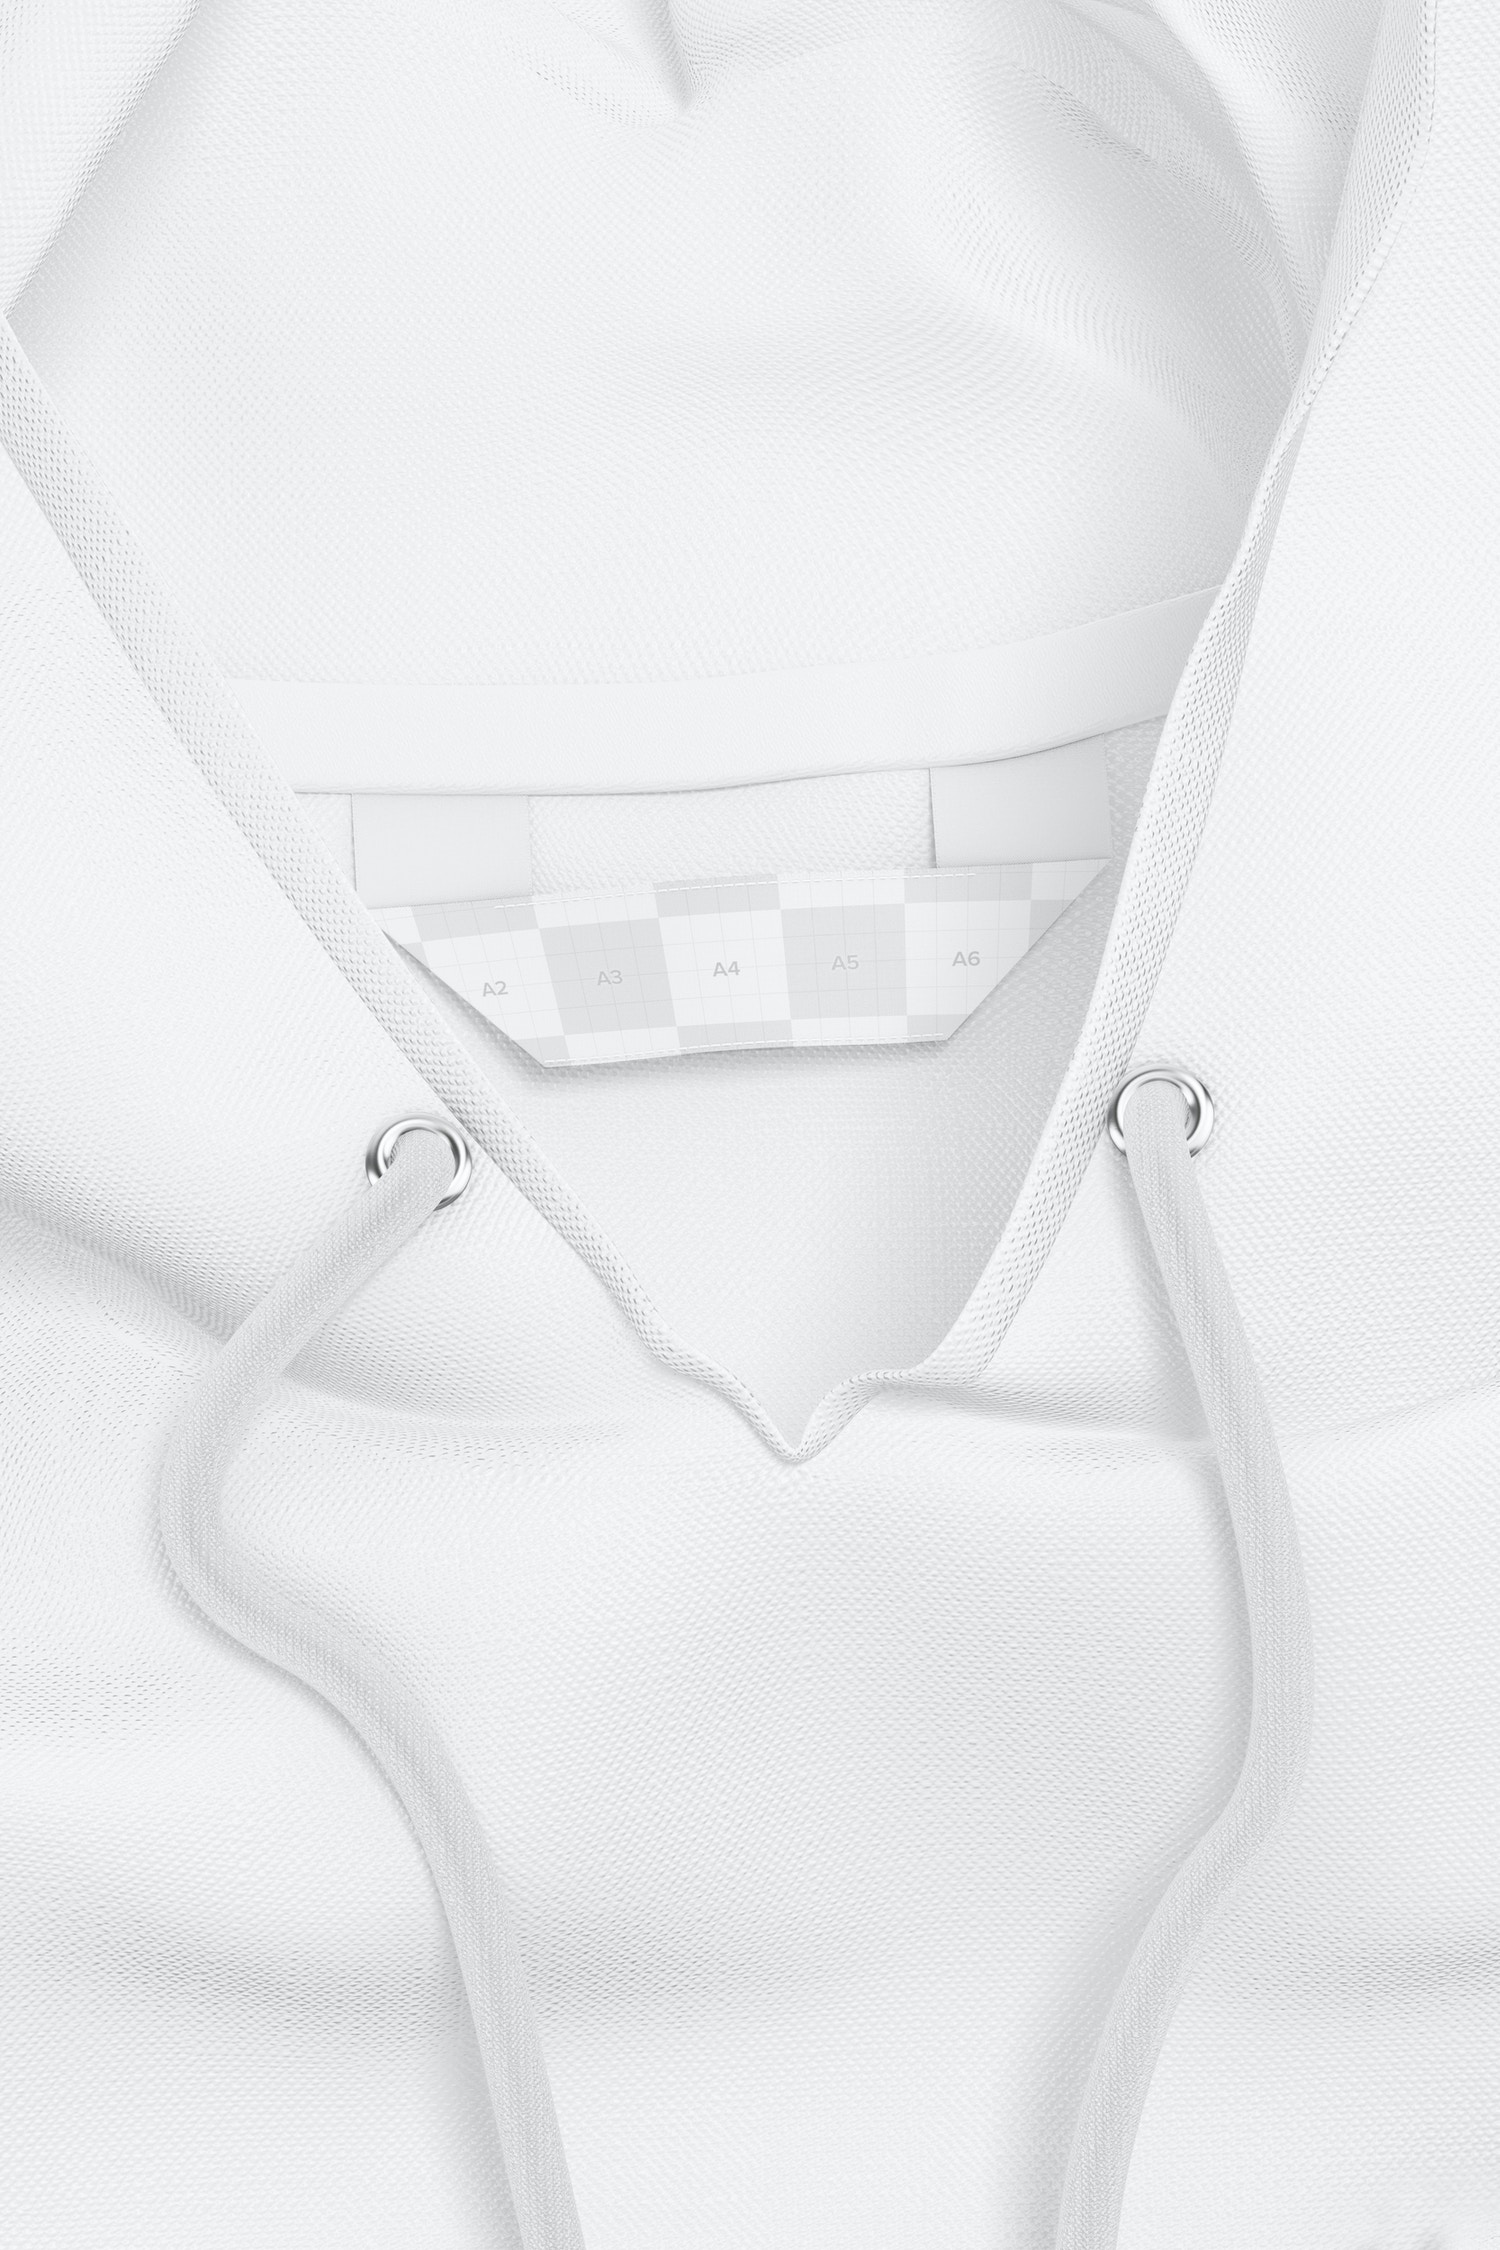 Sewn-In Label on Hoodie Mockup